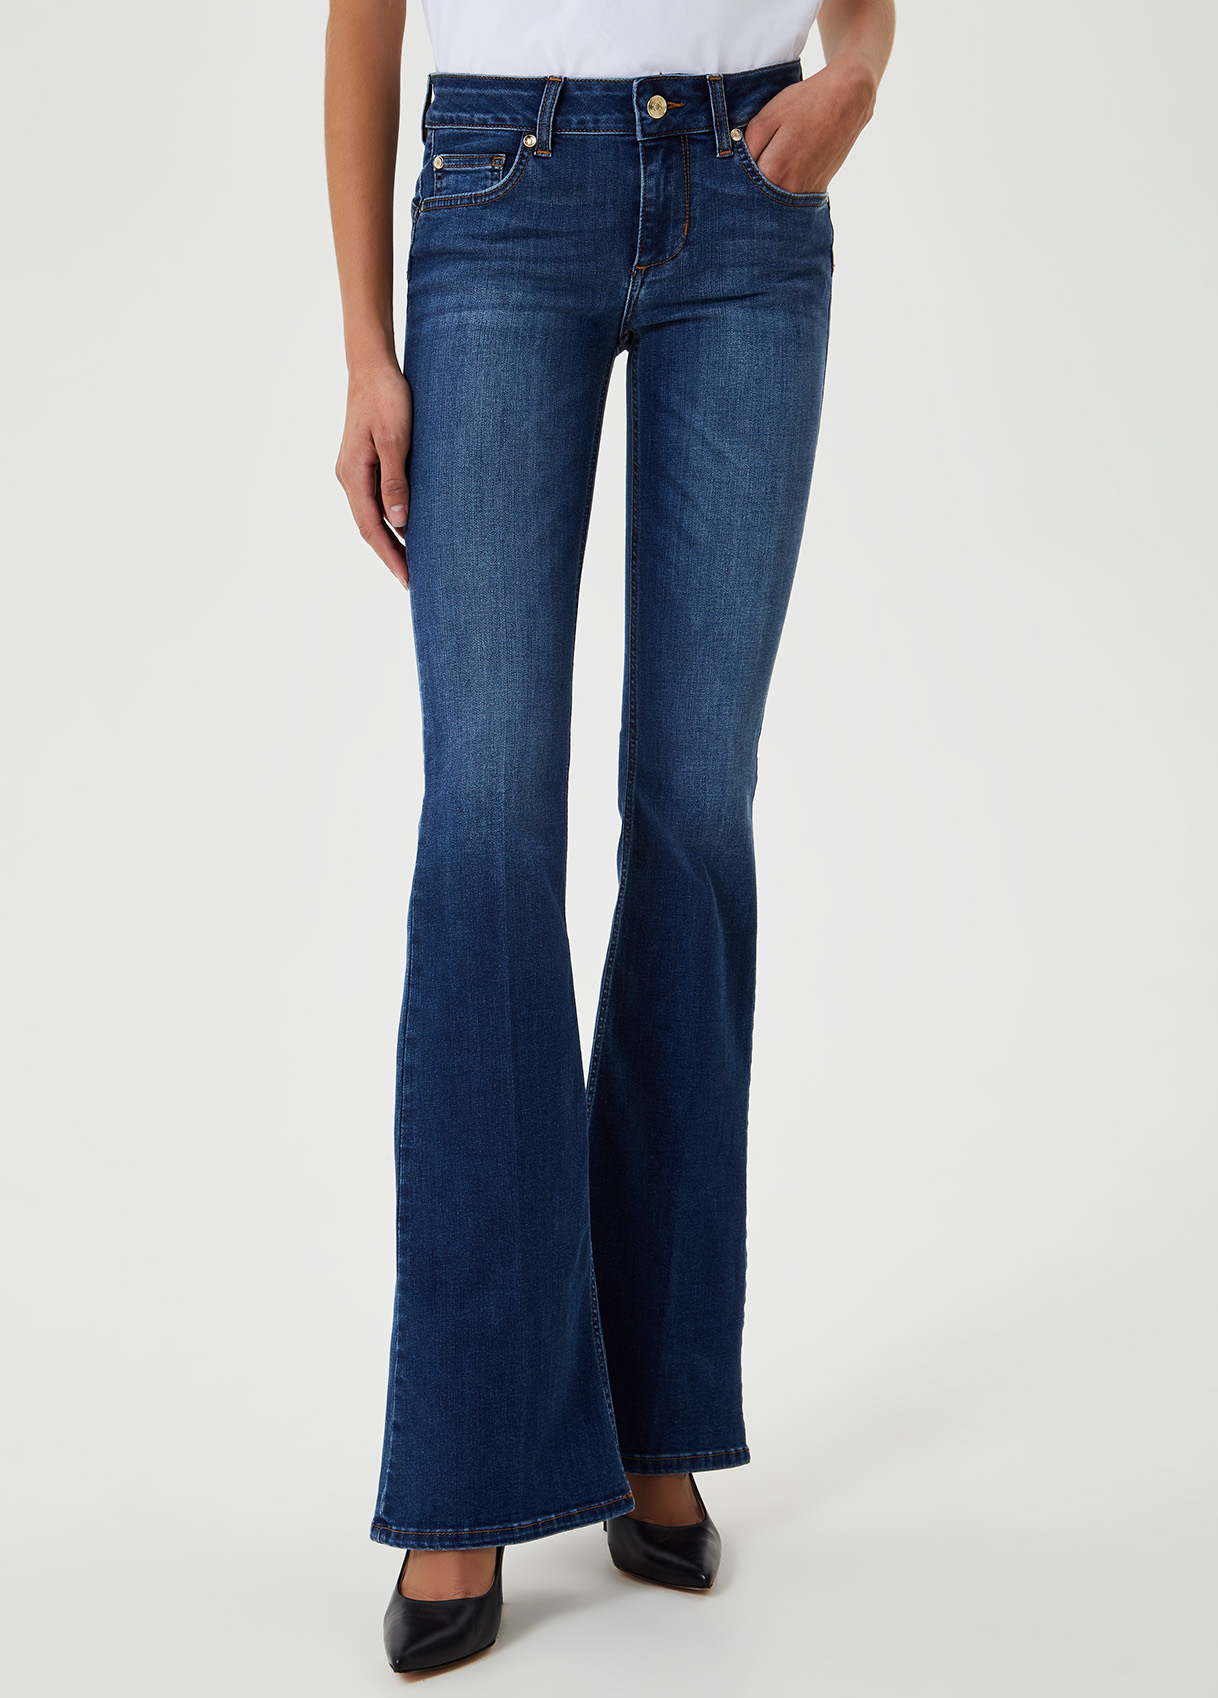 Jeans bootcut-77539-liujo-large